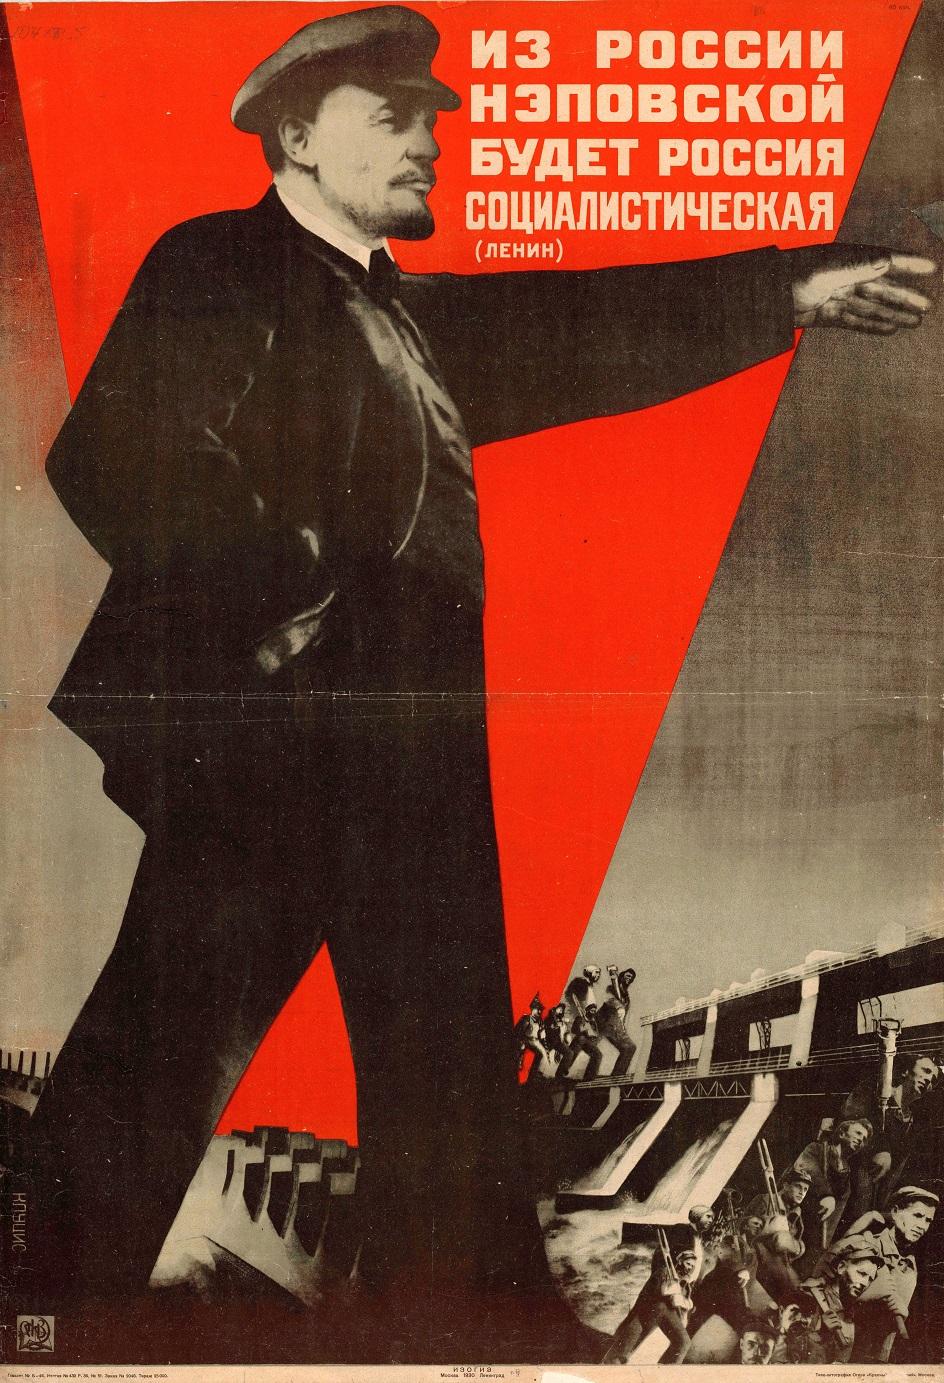 پوستر پوستر شوروی سیاسی 30s